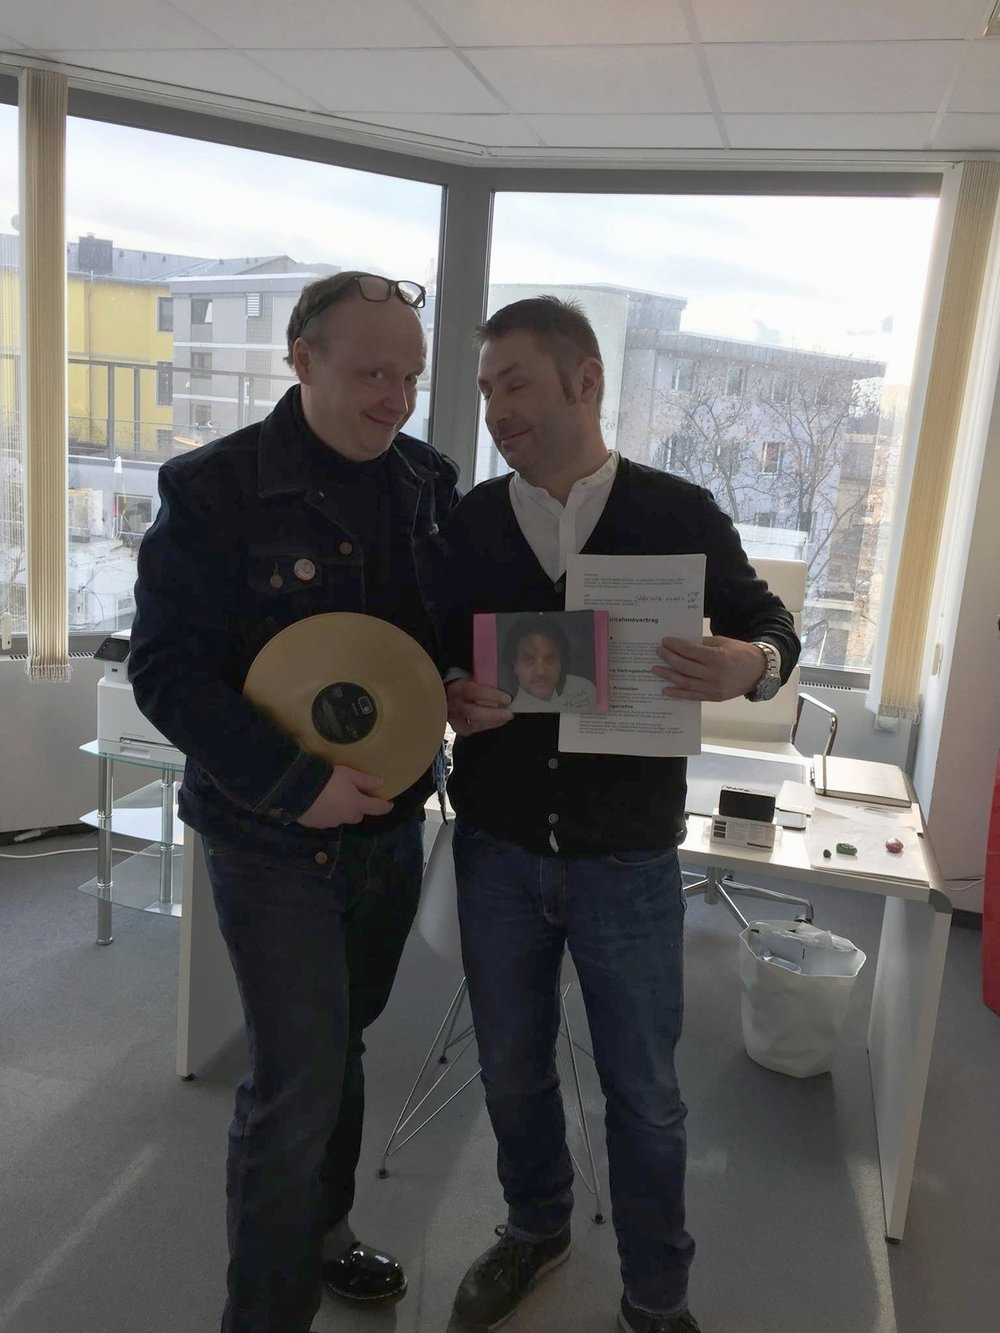 Vertragsunterzeichnung-JürgenMariaKaiser-Crossndawn